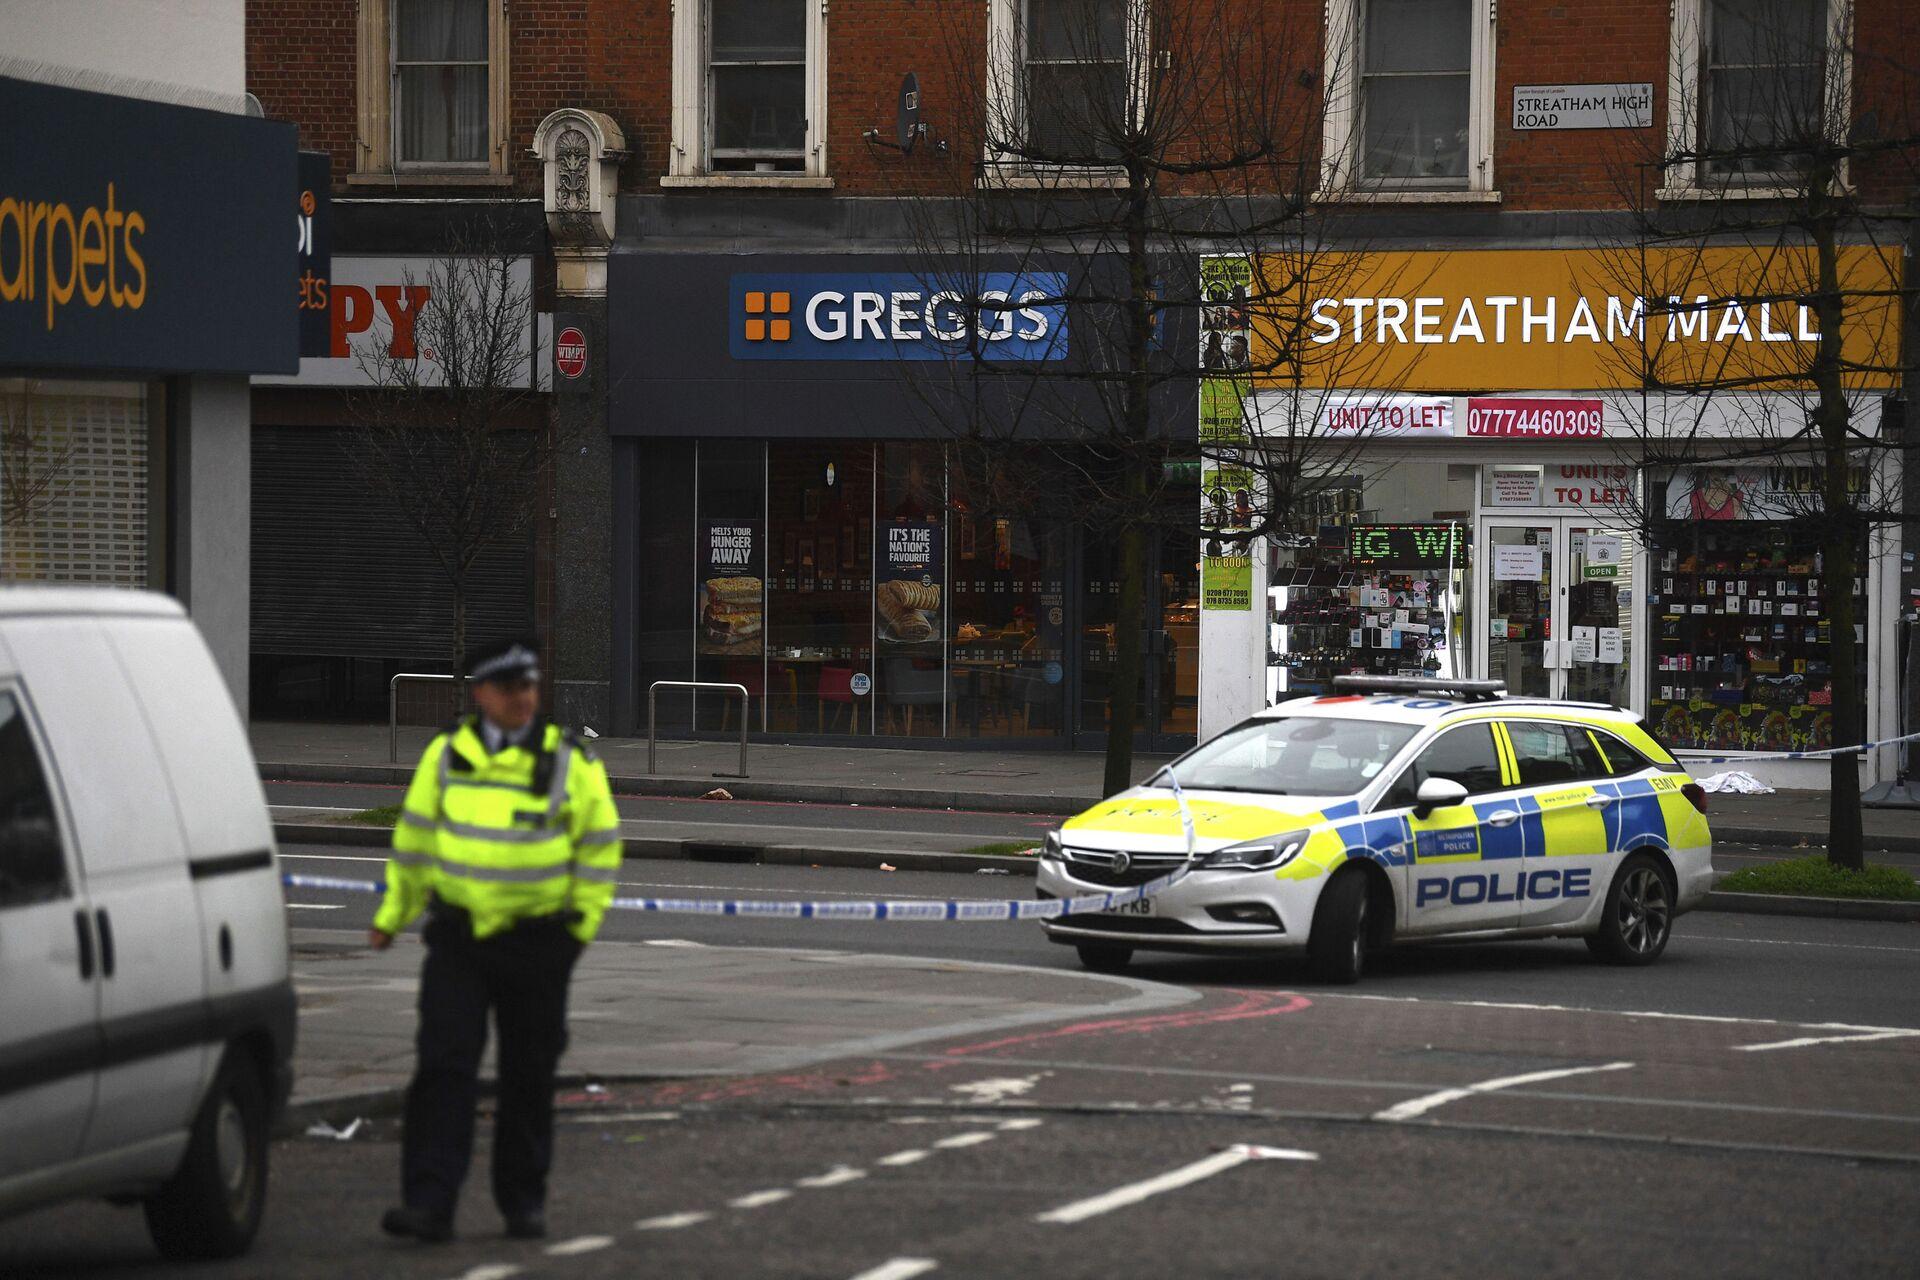 Police attend the scene after an incident in Streatham, London - Sputnik International, 1920, 07.09.2021